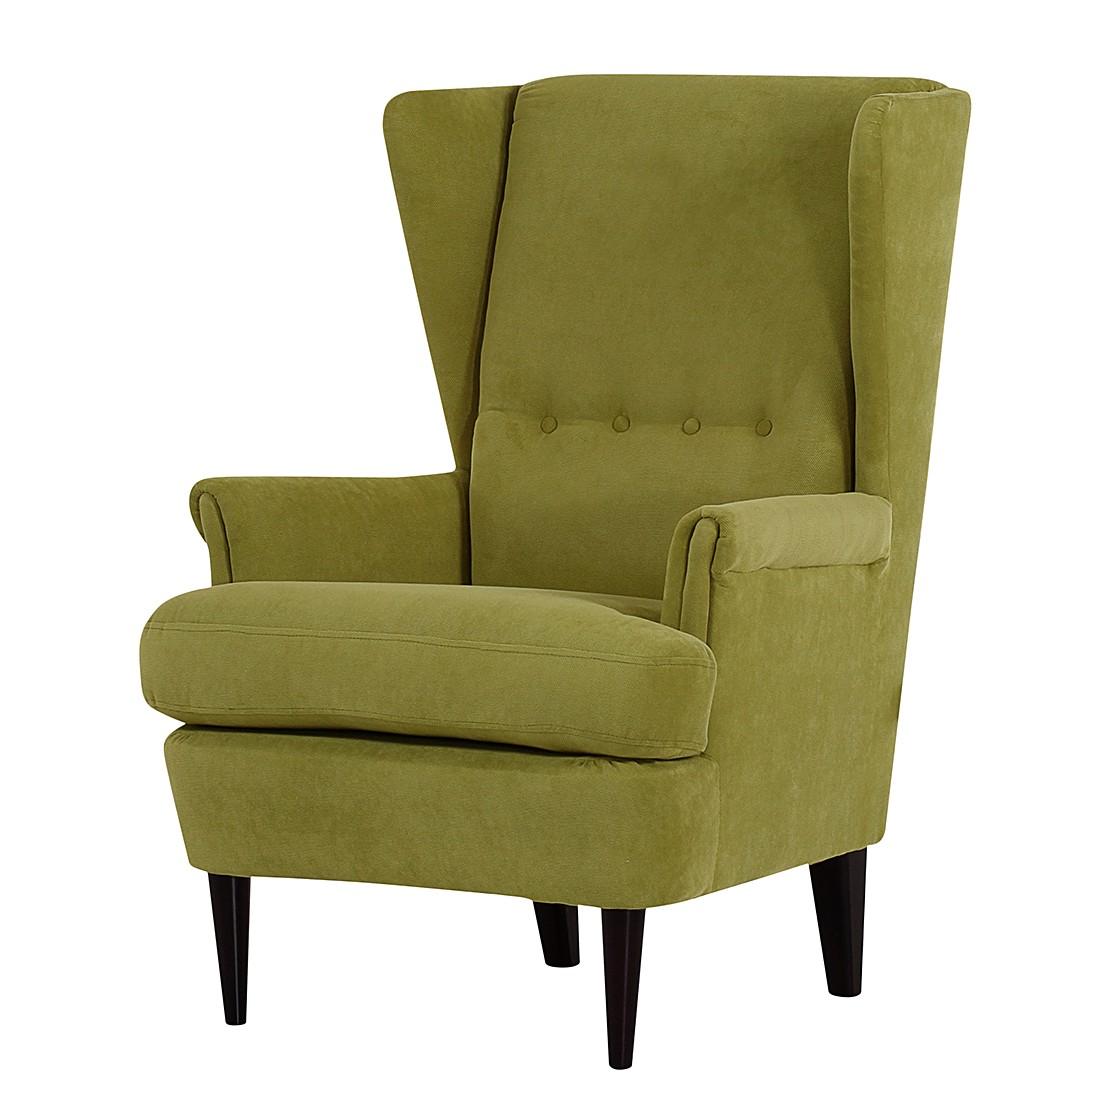 ohrensessel klein g nstig kaufen. Black Bedroom Furniture Sets. Home Design Ideas